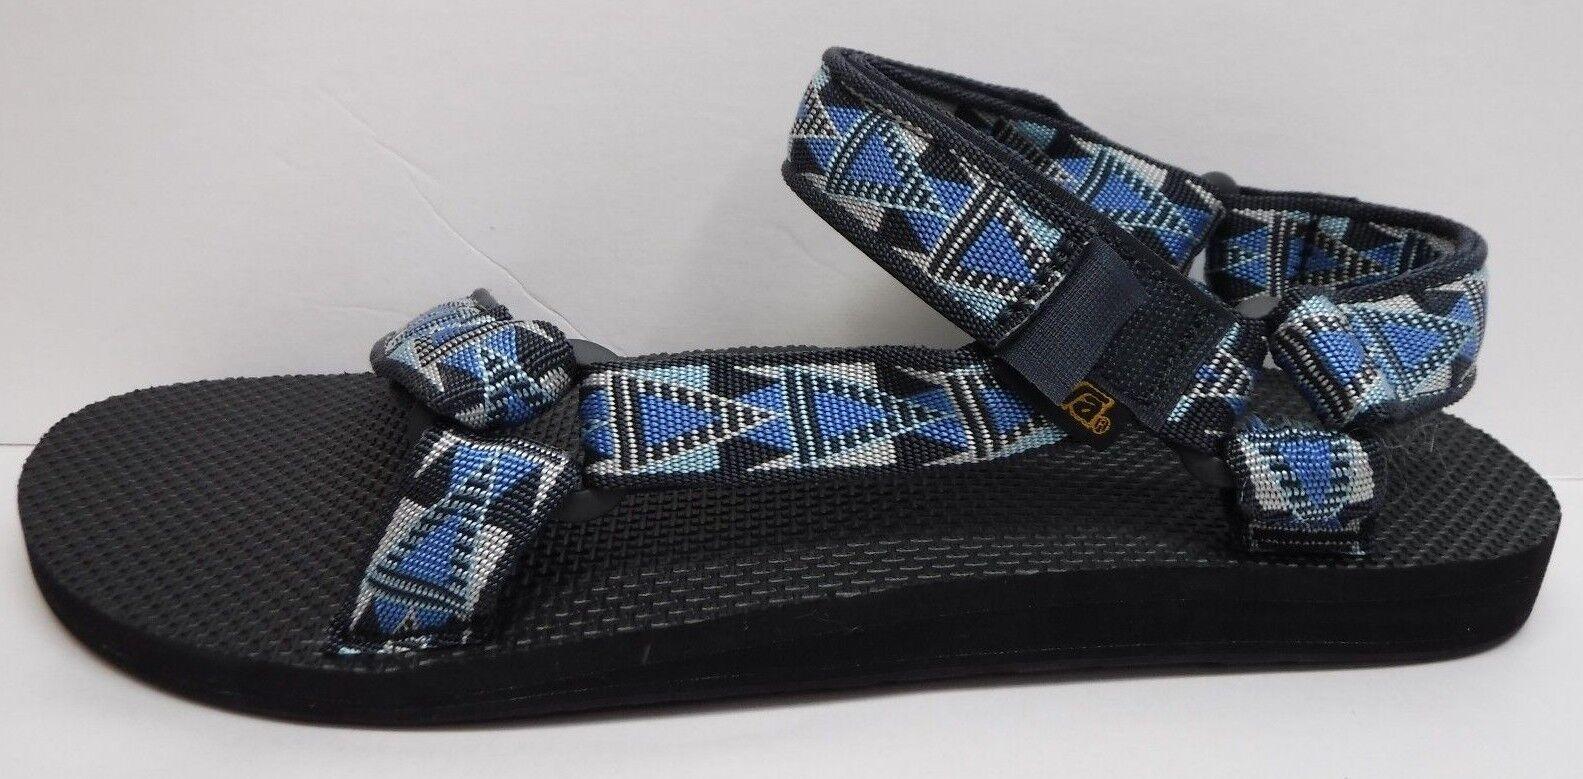 Teva Taglia 10 Blue Sandals New Uomo Scarpe